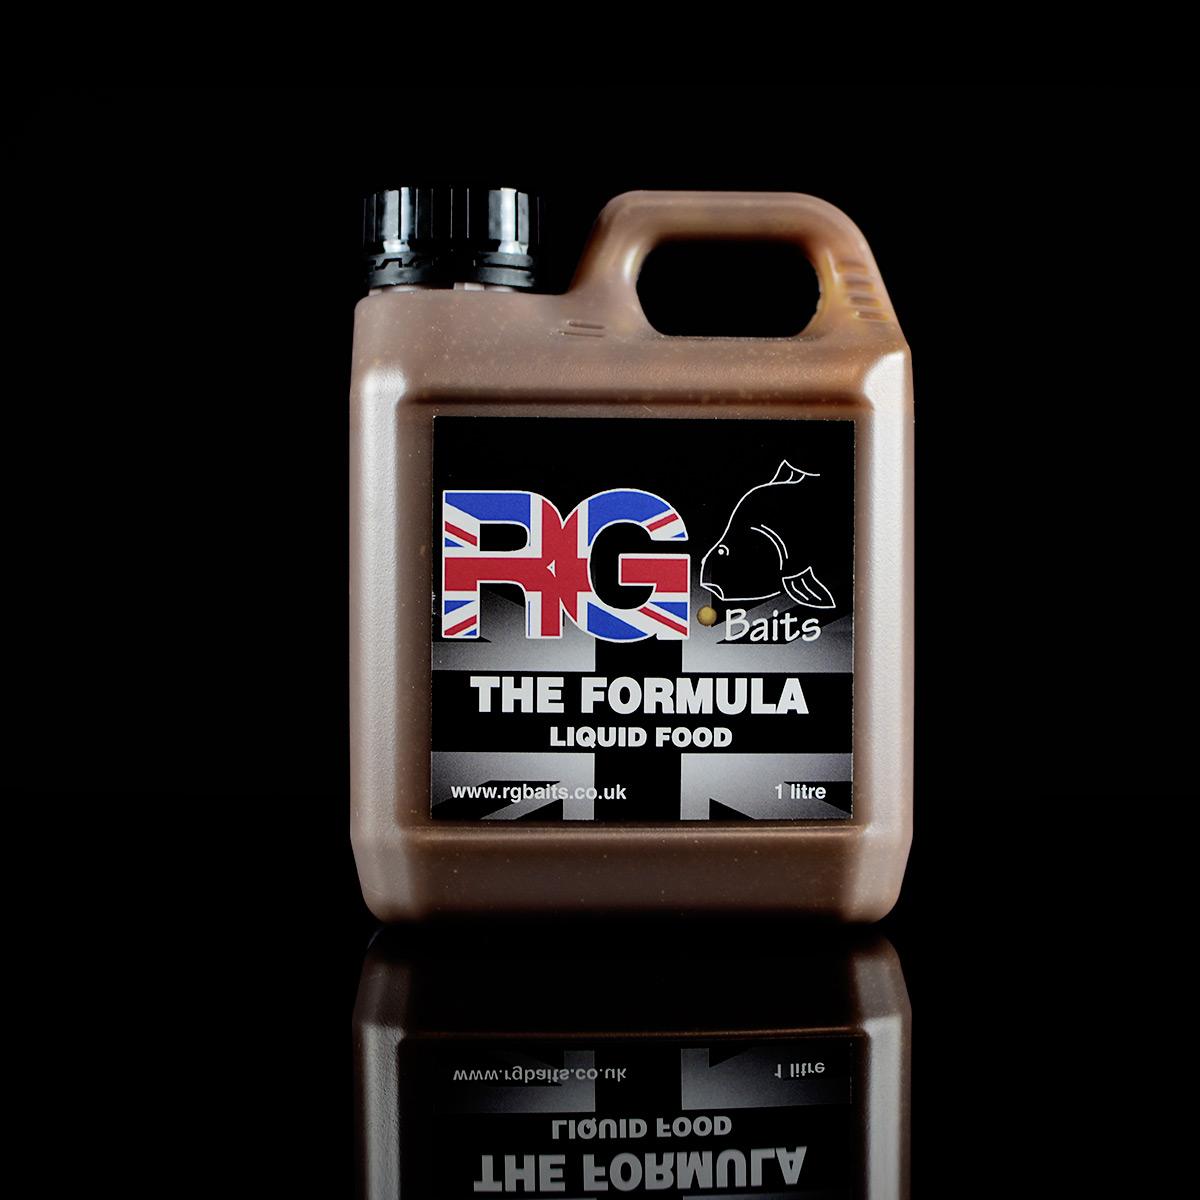 The Formula Liquid Food